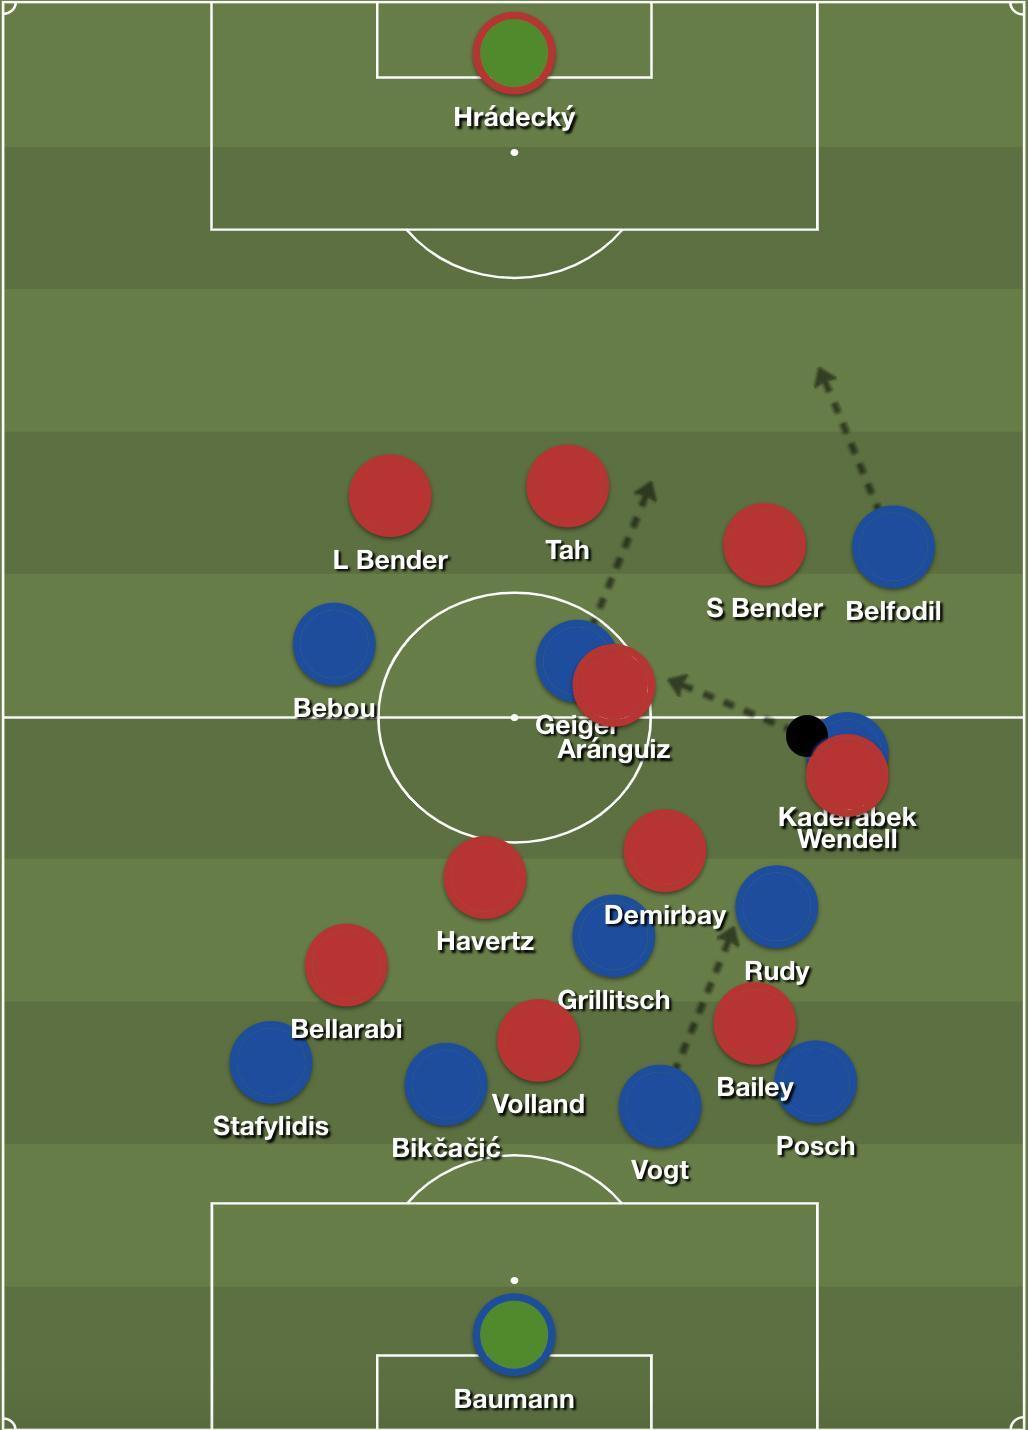 Hoffenheim's setup for the chance, using Kadeřábek as the target in transition